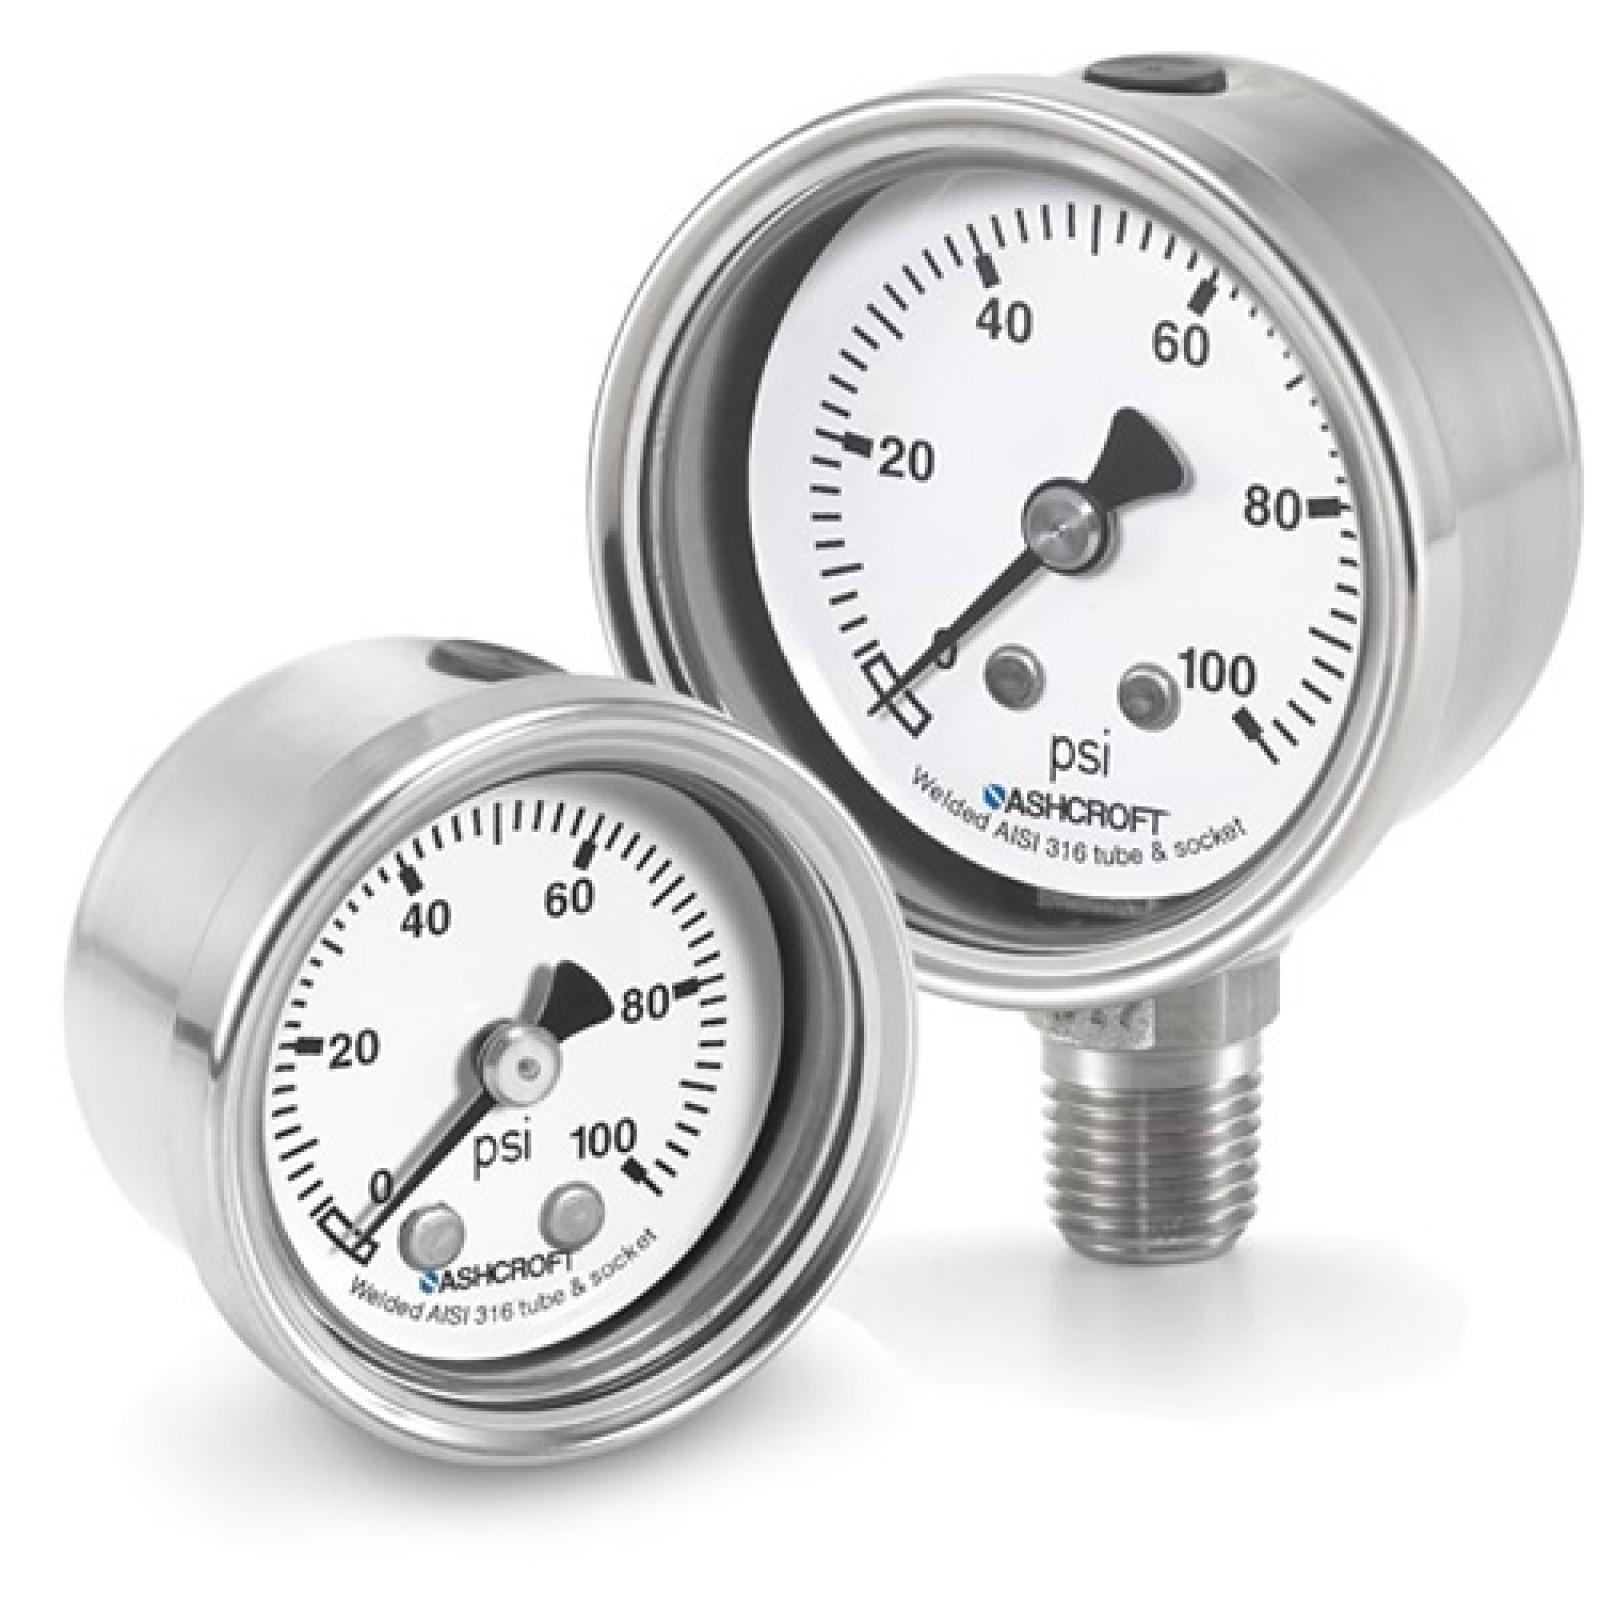 "63 1008S 02L XLL 15000#/KP - Pressure Gauge, 63mm stainless 1/4"" NPT Lower conn & Case, Plus Performance 0/15,000 psi"